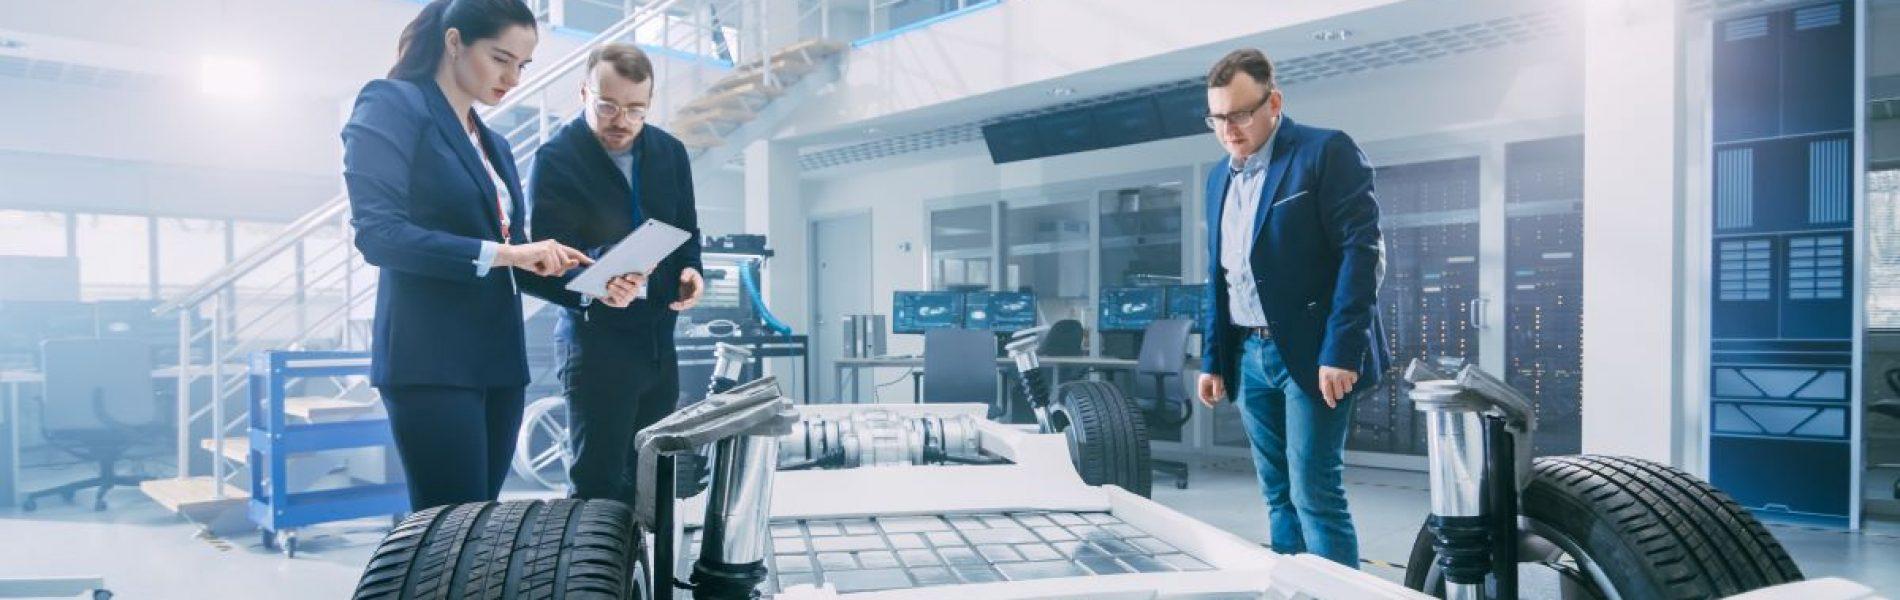 XenomatiX_Engineering_Services_Lidar_Solutions